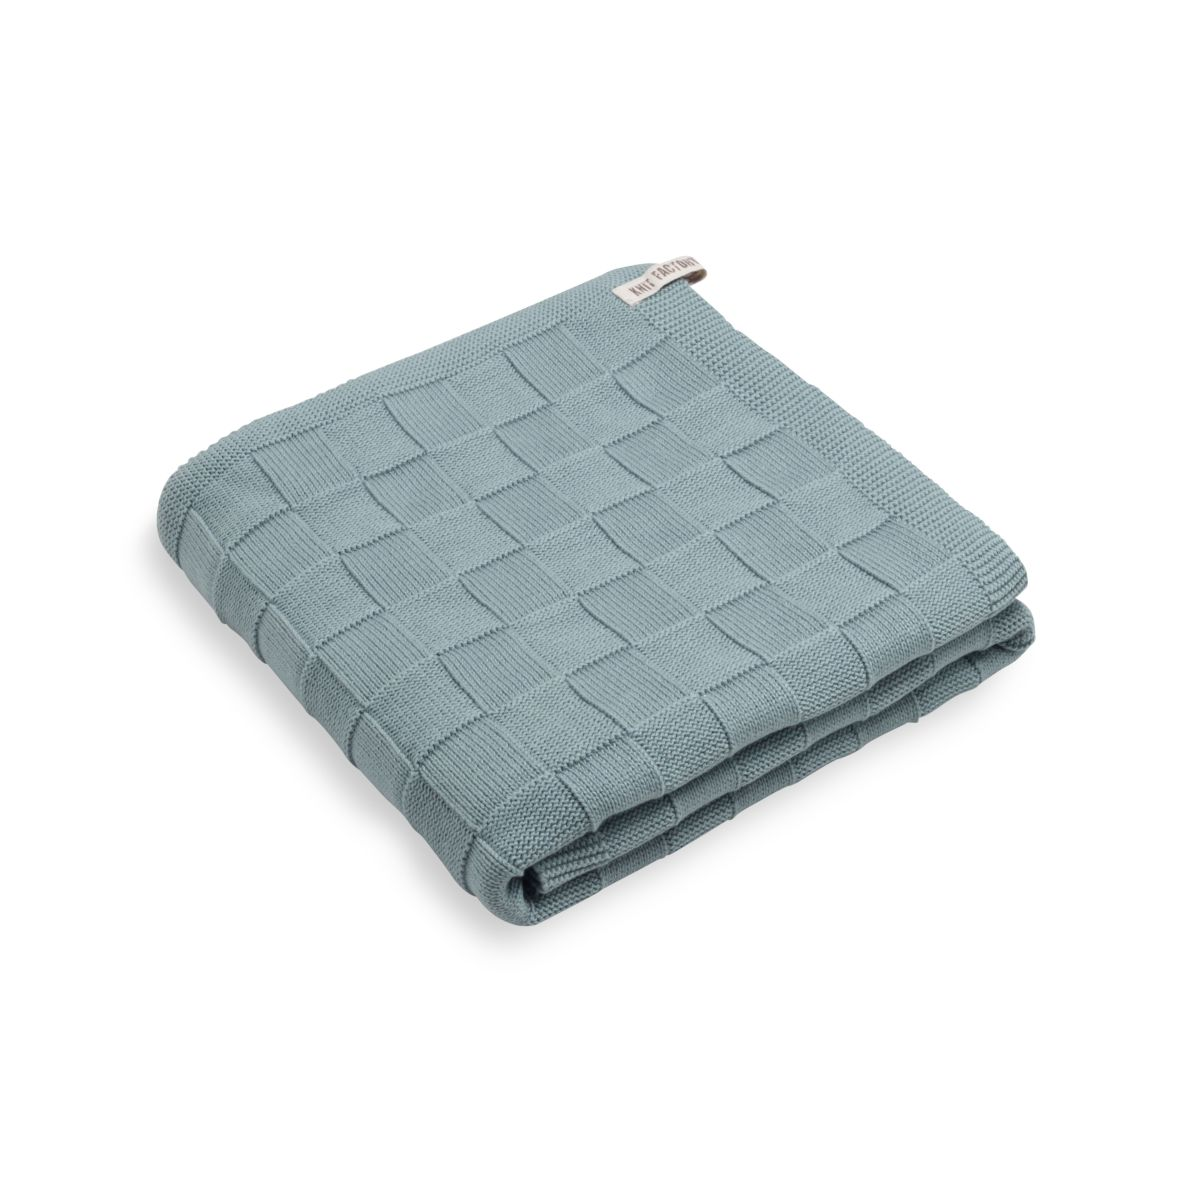 knit factory kf20222500951 badhanddoek ivy stone green 1